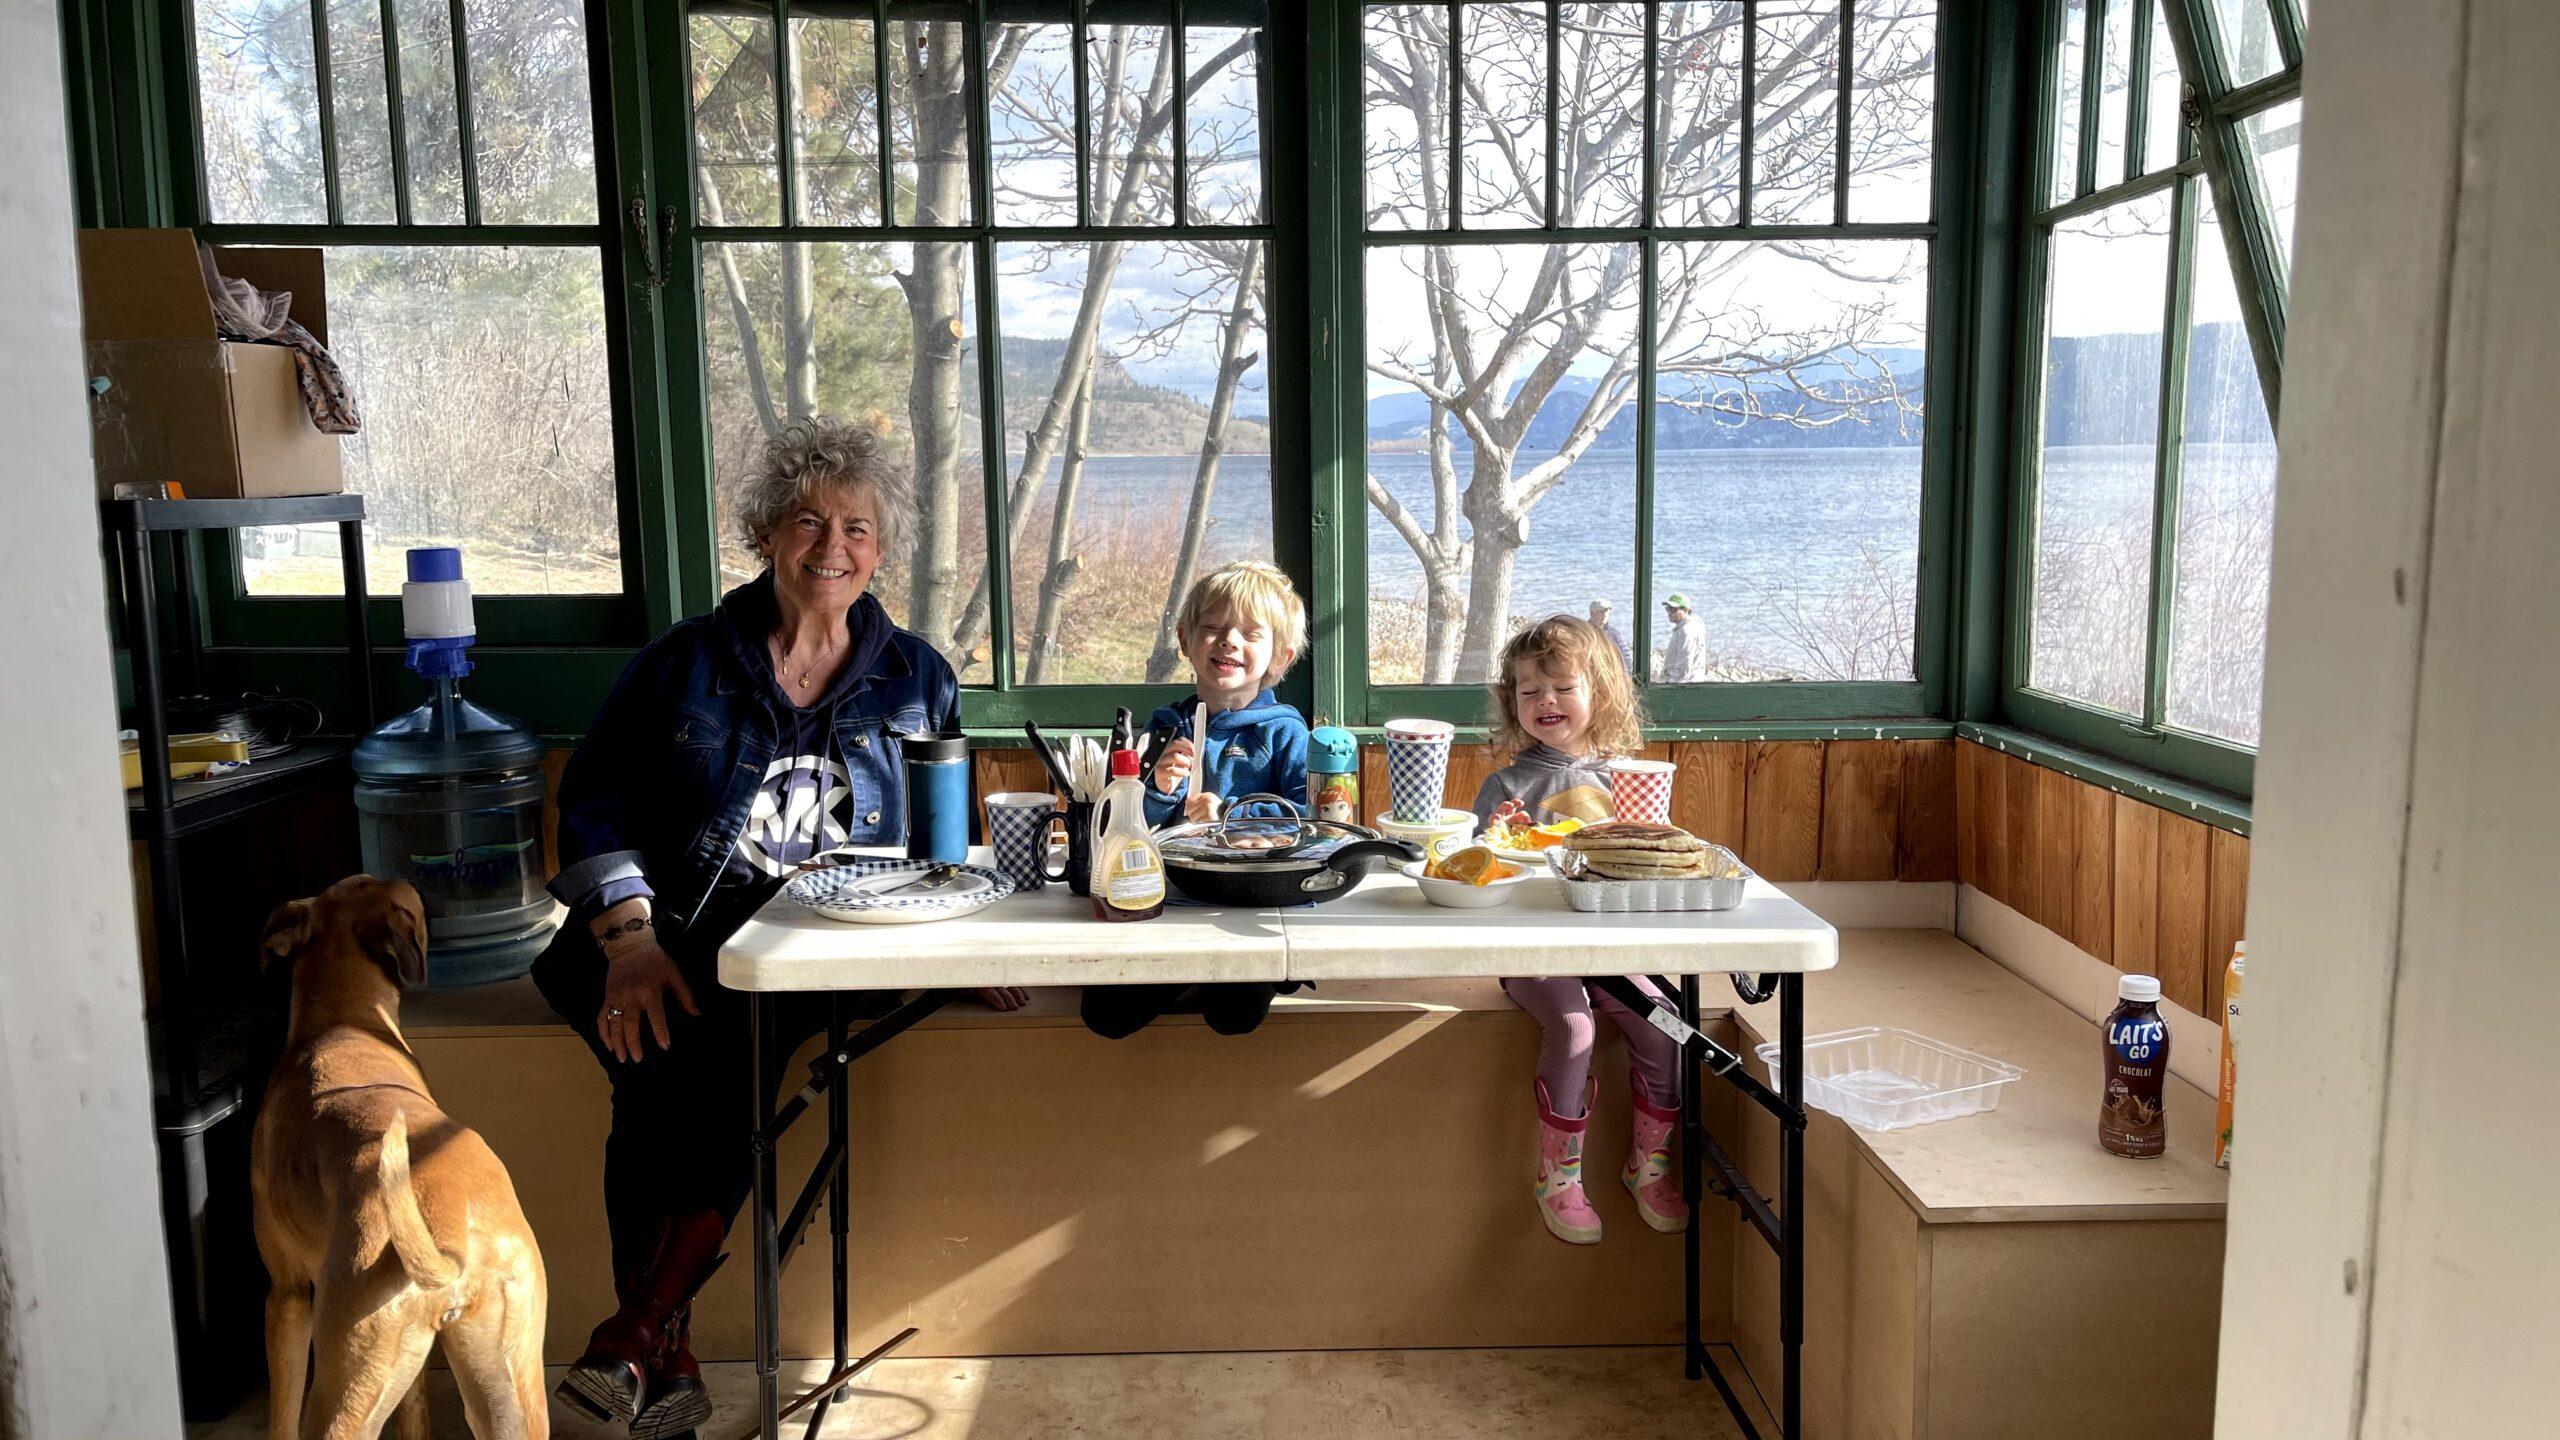 Jillian Harris' Mom and Kids enjoying the farmhouse mid renovation